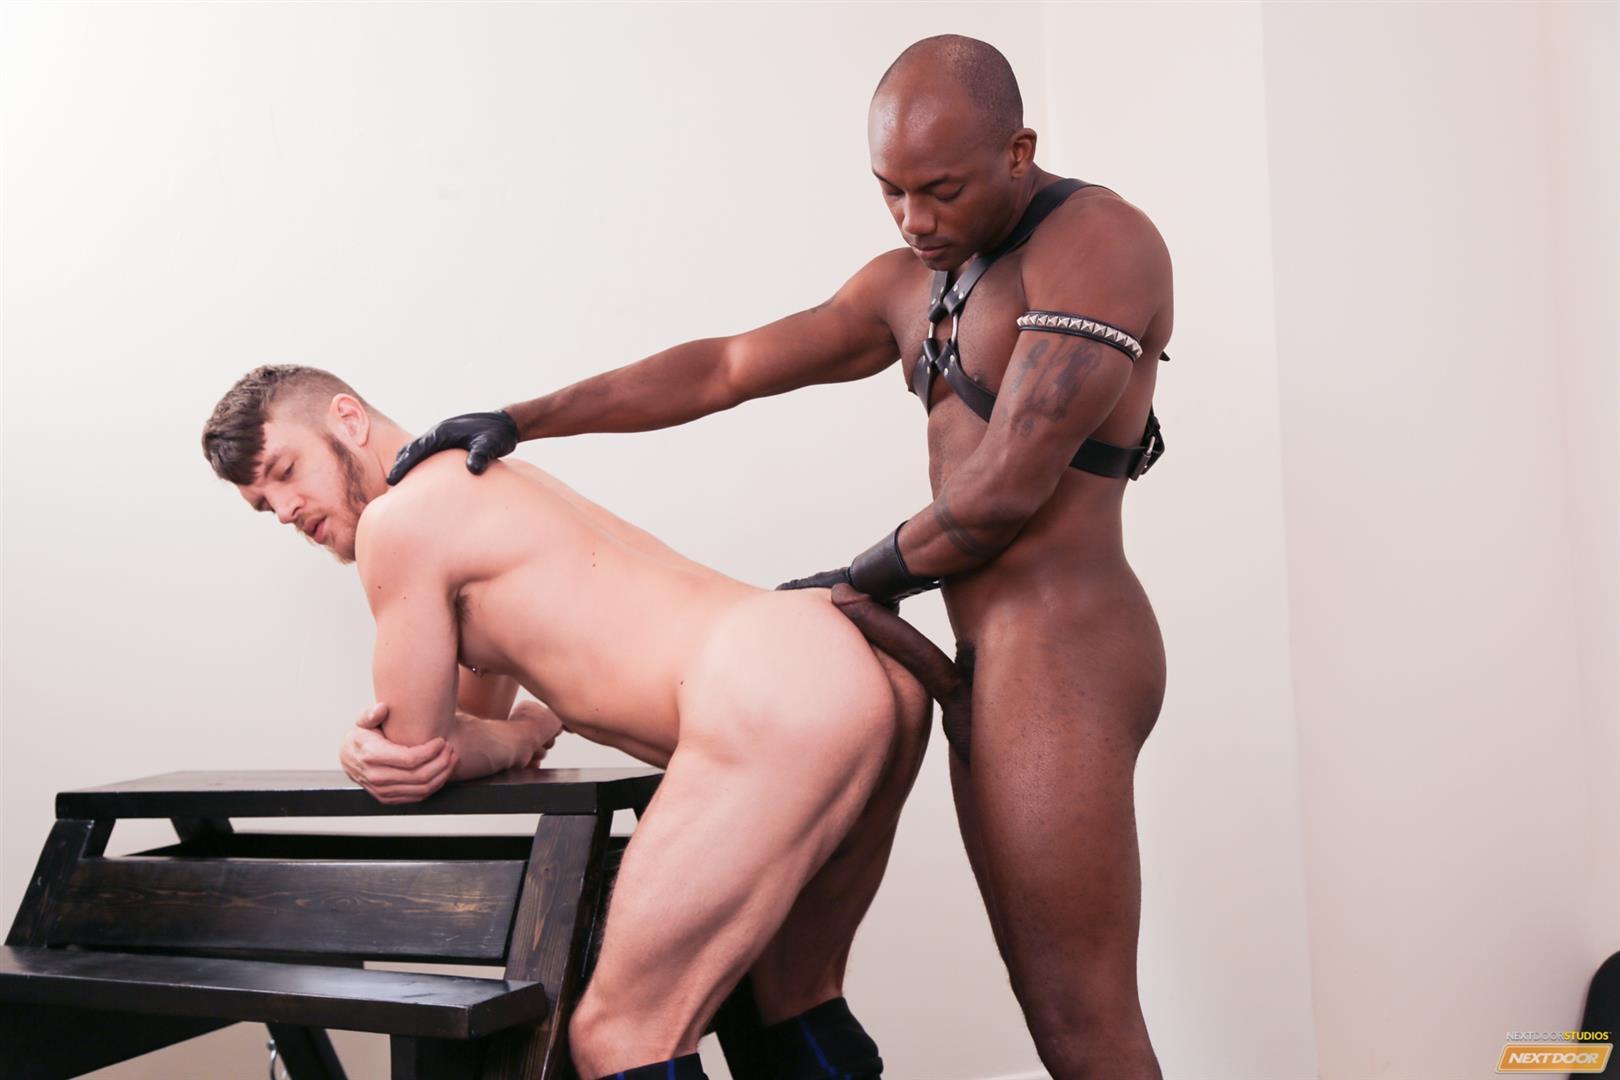 Next-Door-Ebony-Osiris-Blade-and-Caleb-King-Big-Black-Cock-In-White-Ass-Amateur-Gay-Porn-14 Caleb King Gets Dominated By Osiris Blade's Big Black Cock